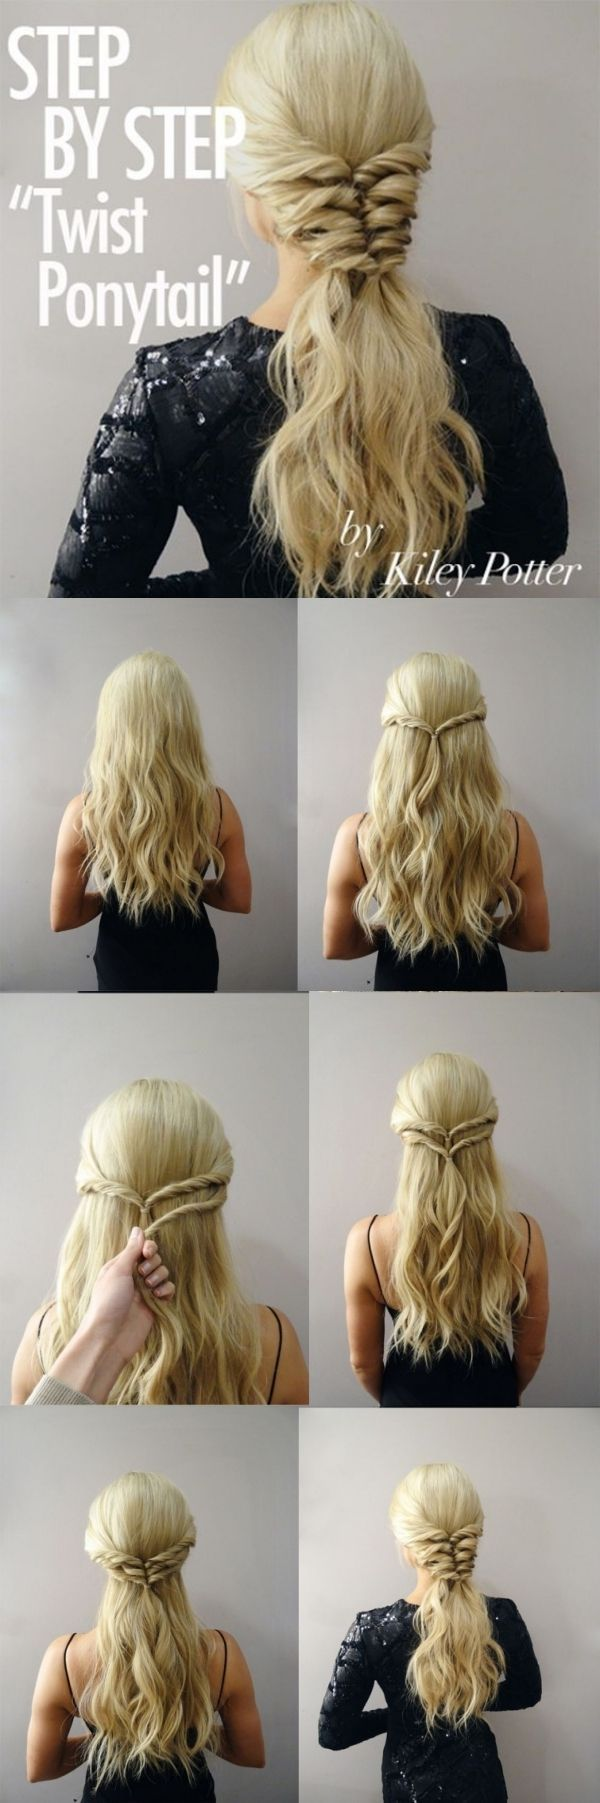 Step by step twist ponytail by kiley potter step by step